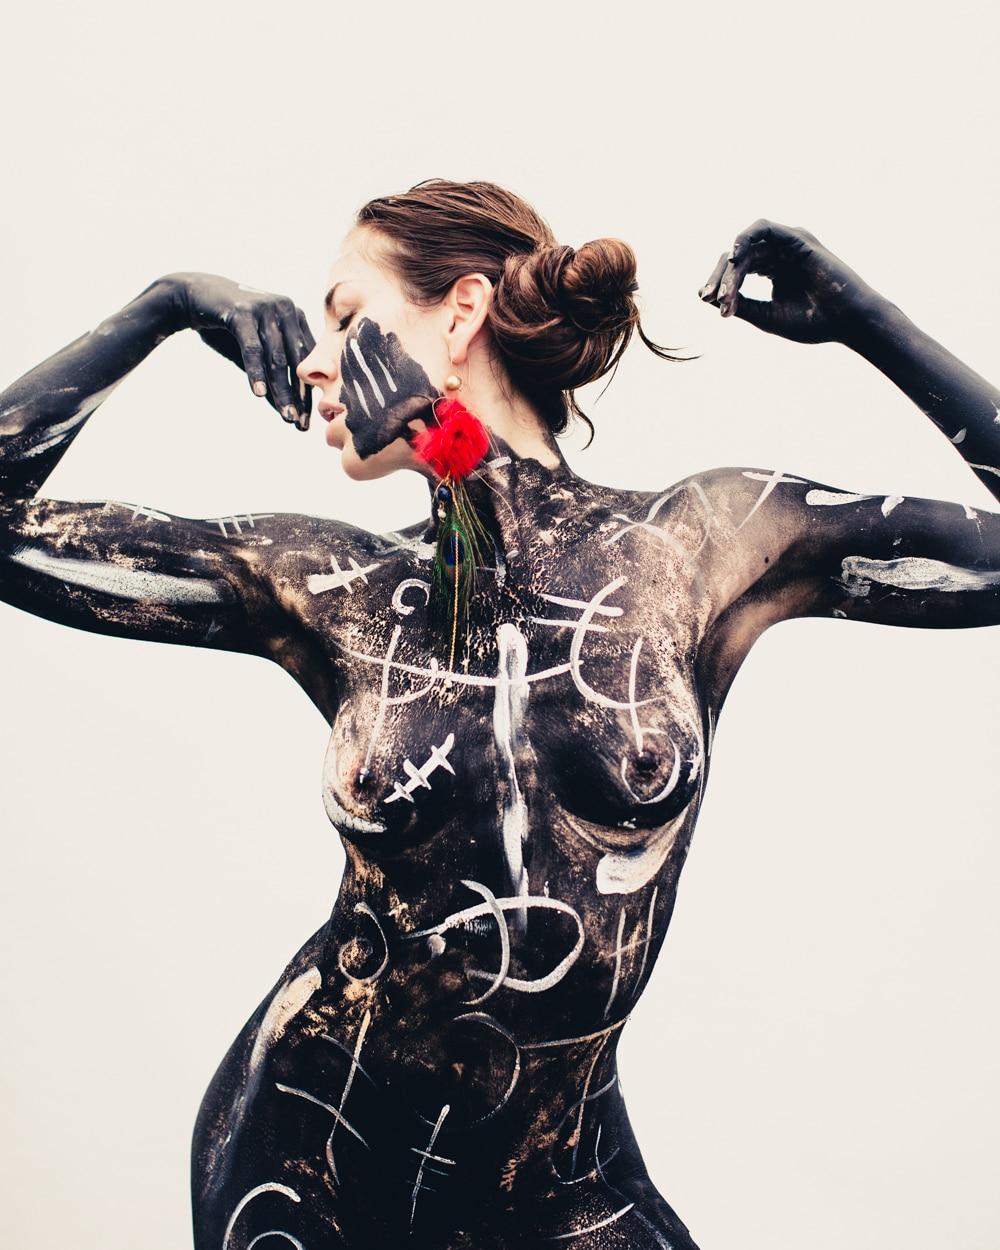 primal_fashion_by_gregory_beylerian-7